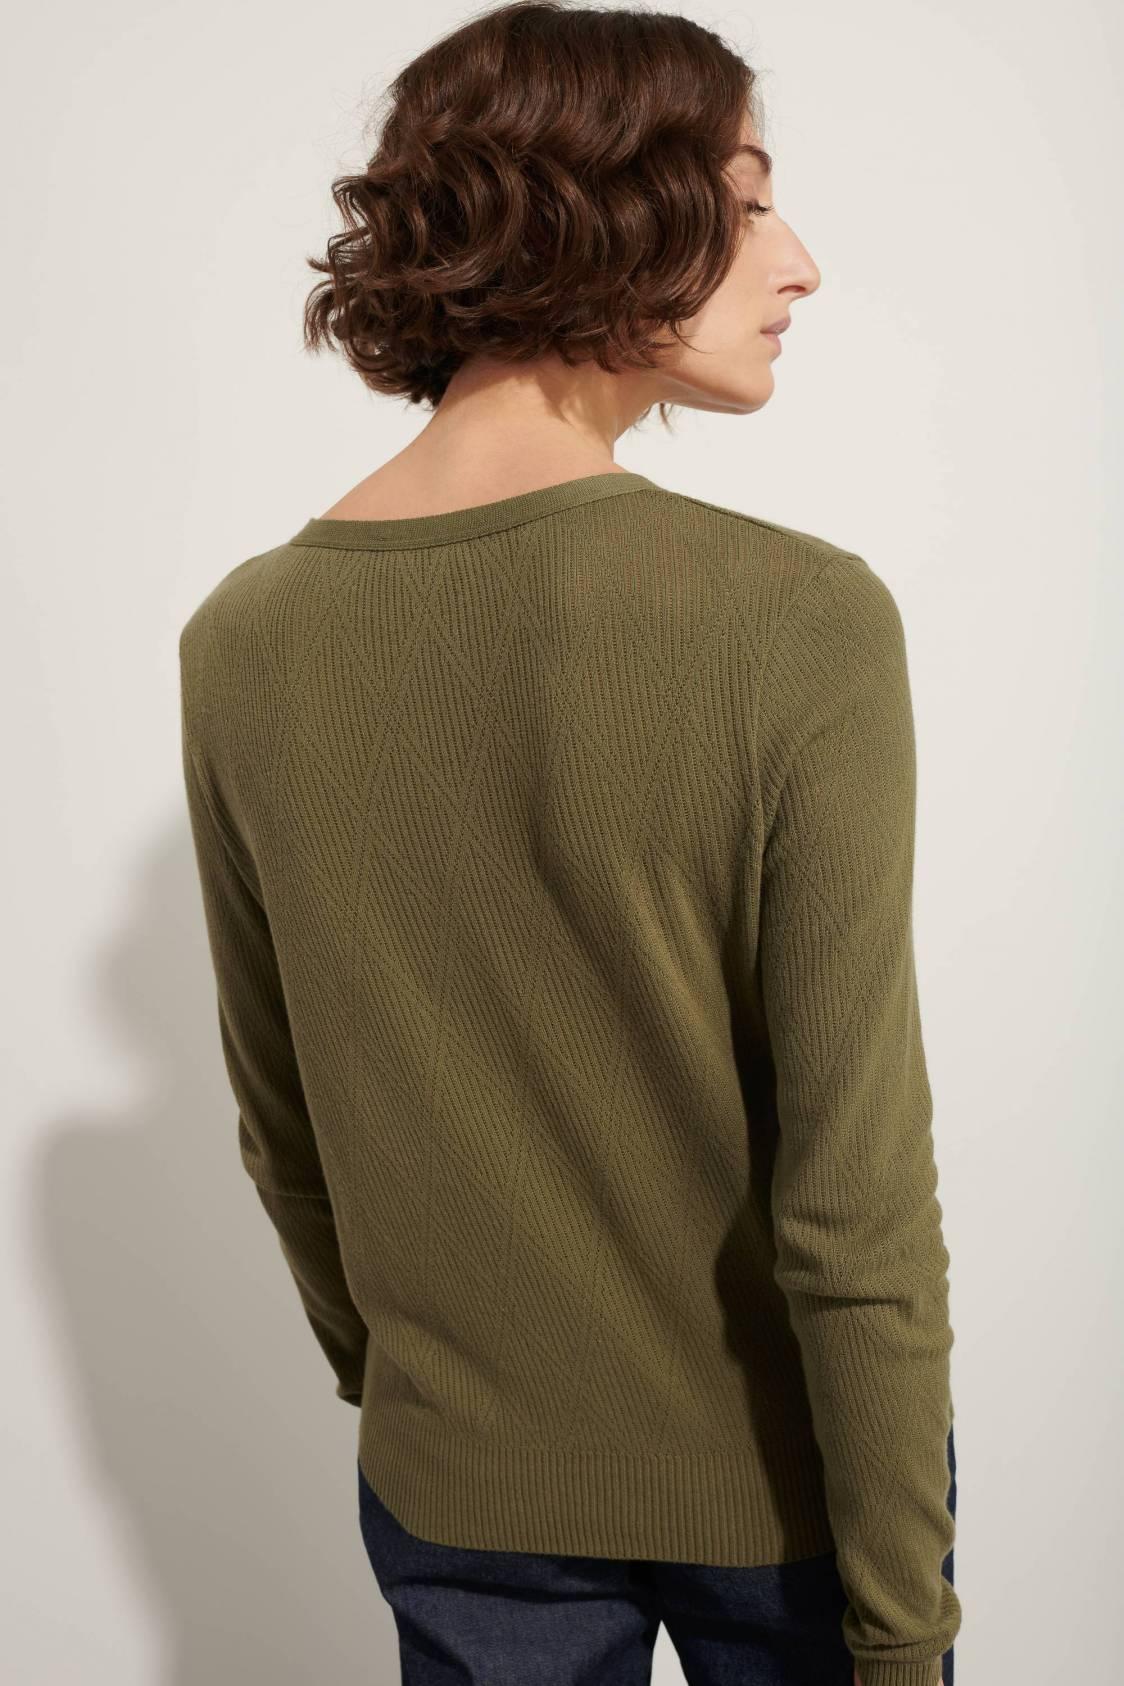 Diamond-shape jacquard sweater